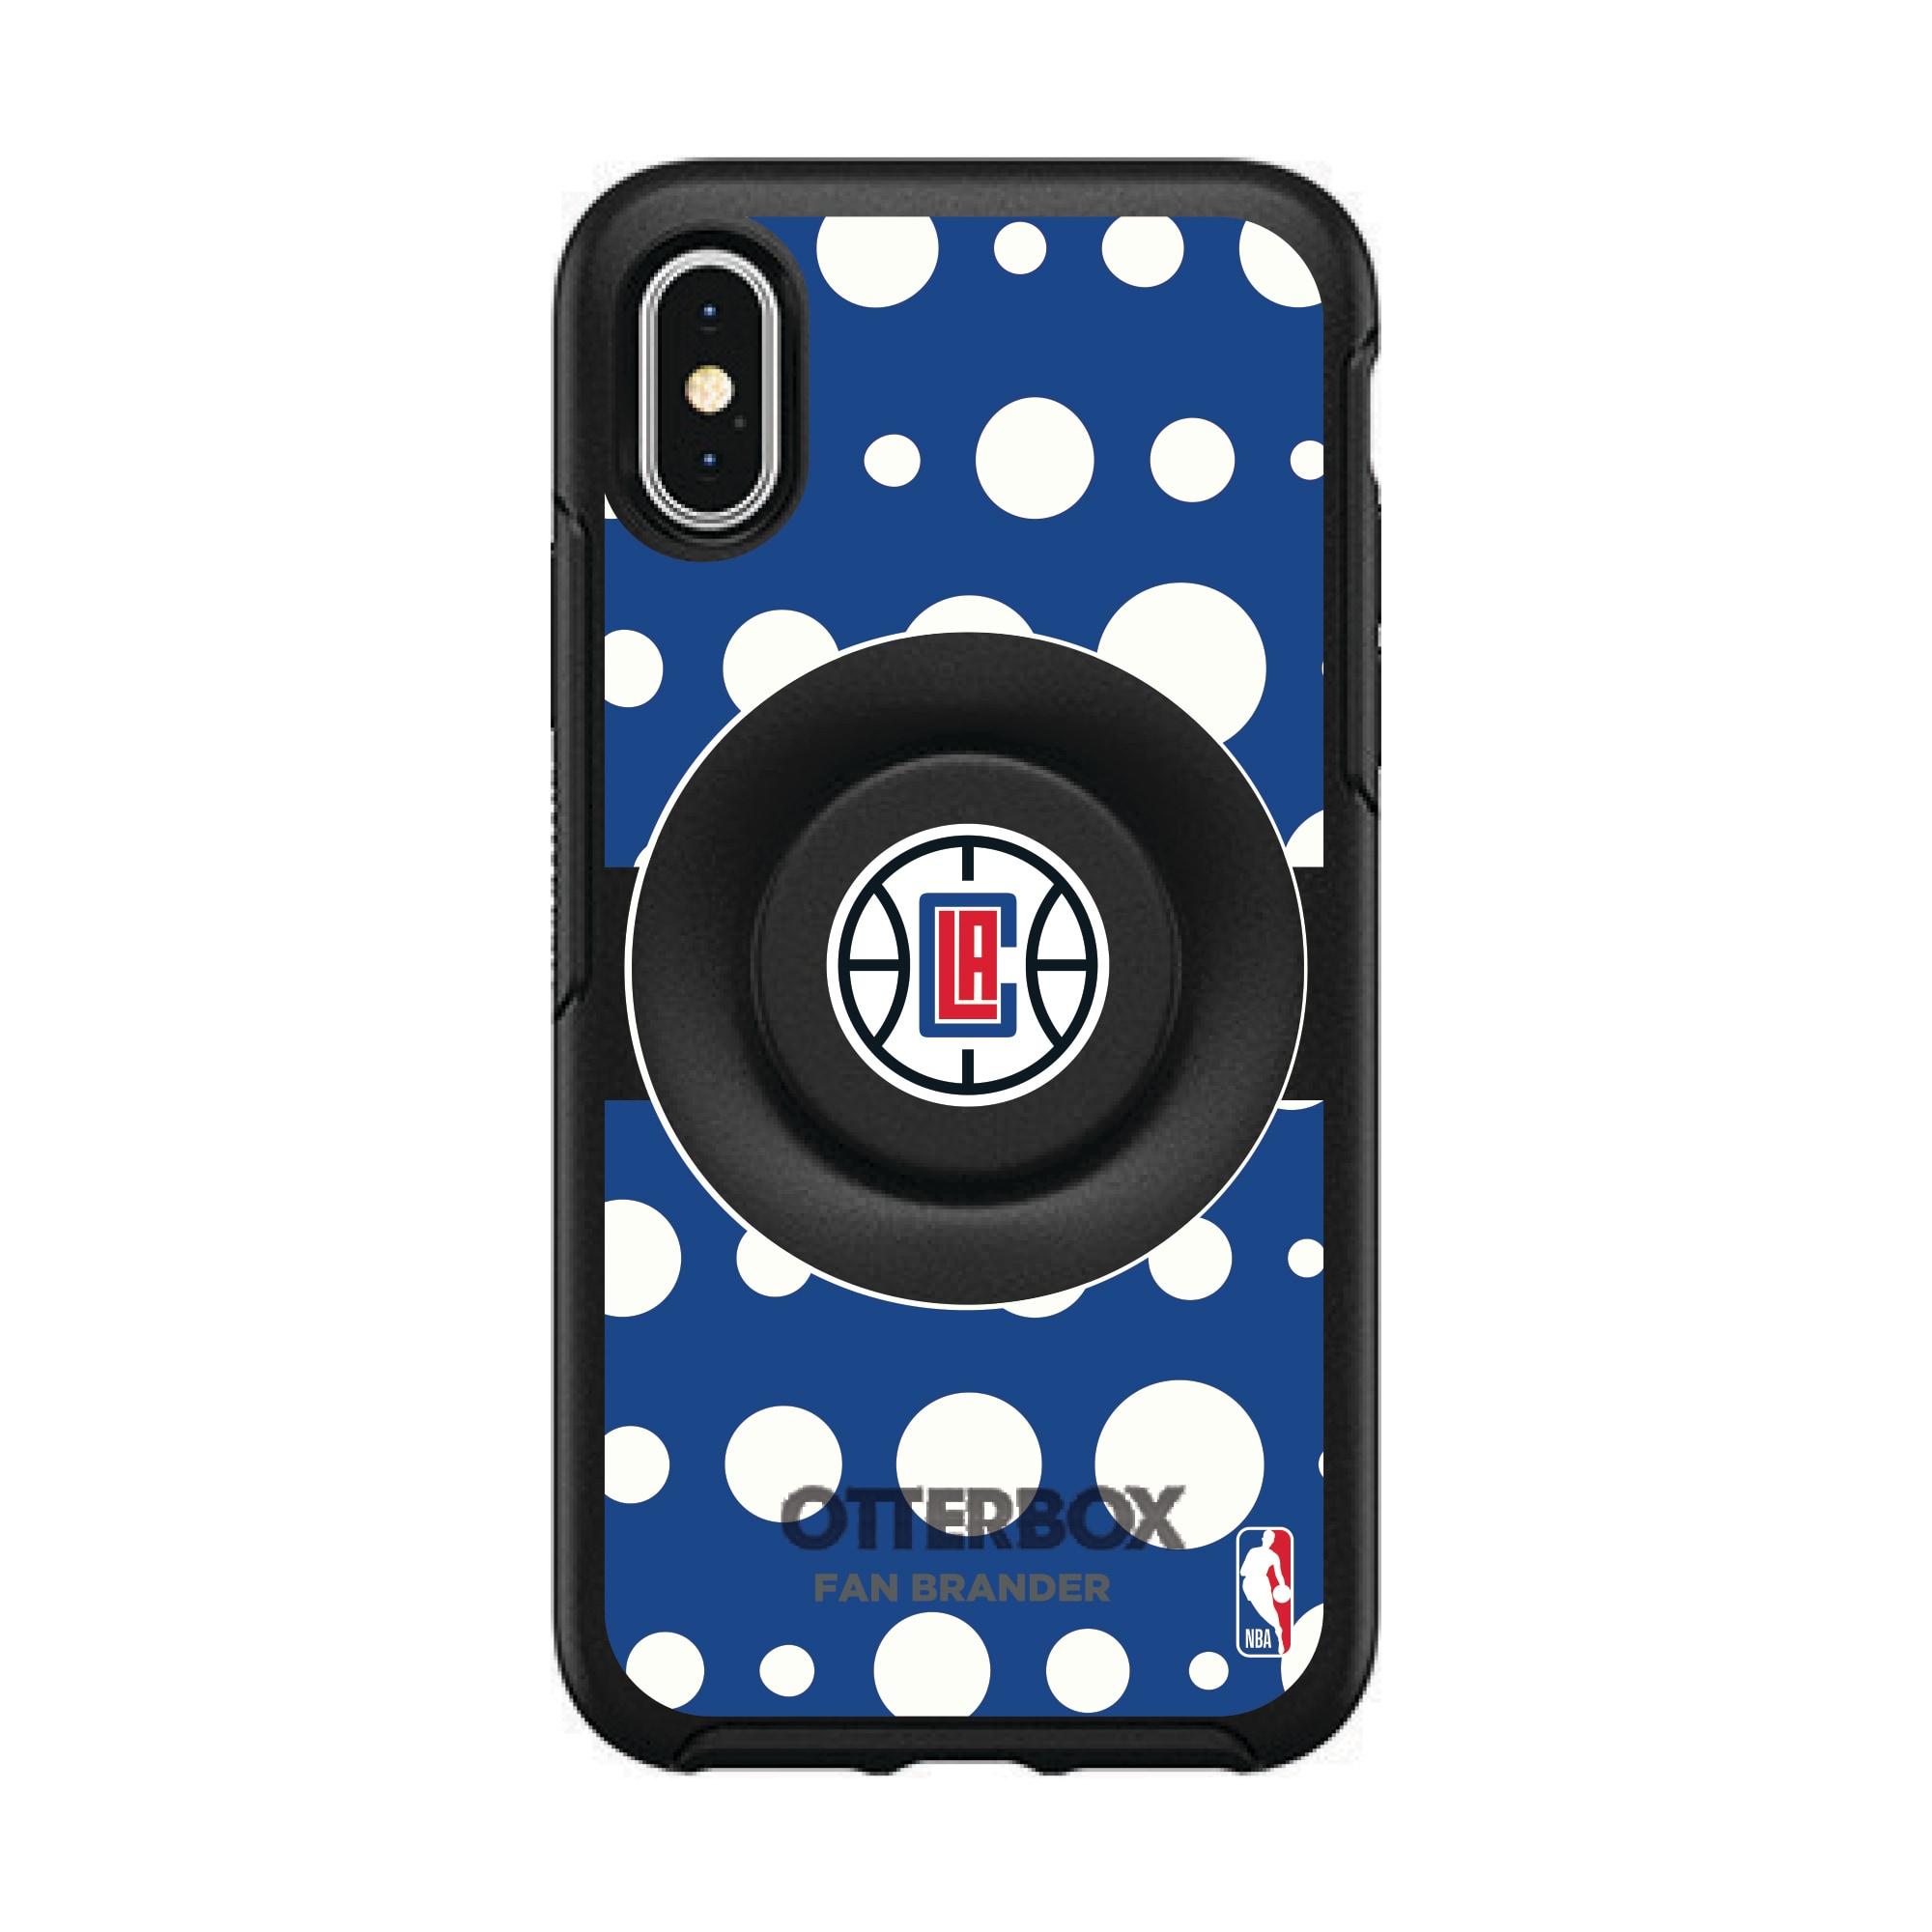 LA Clippers OtterBox Otter+Pop PopSocket Polka Dot iPhone Case